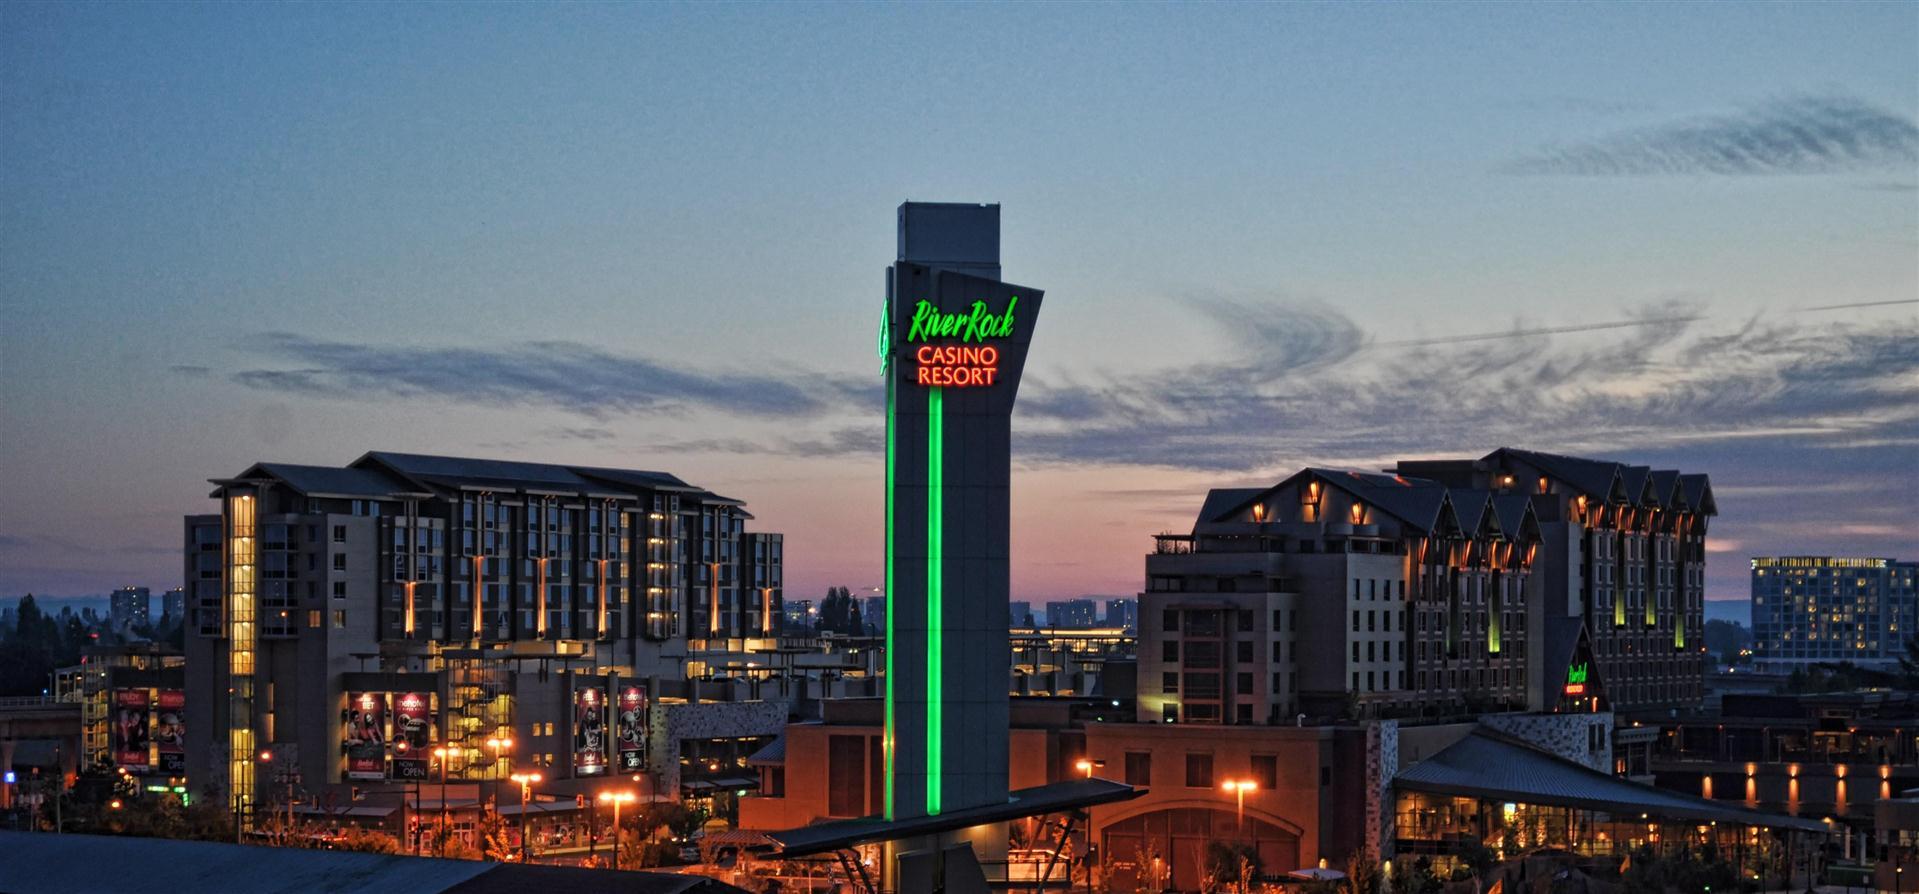 River rock casino night market address casino employment manuel san